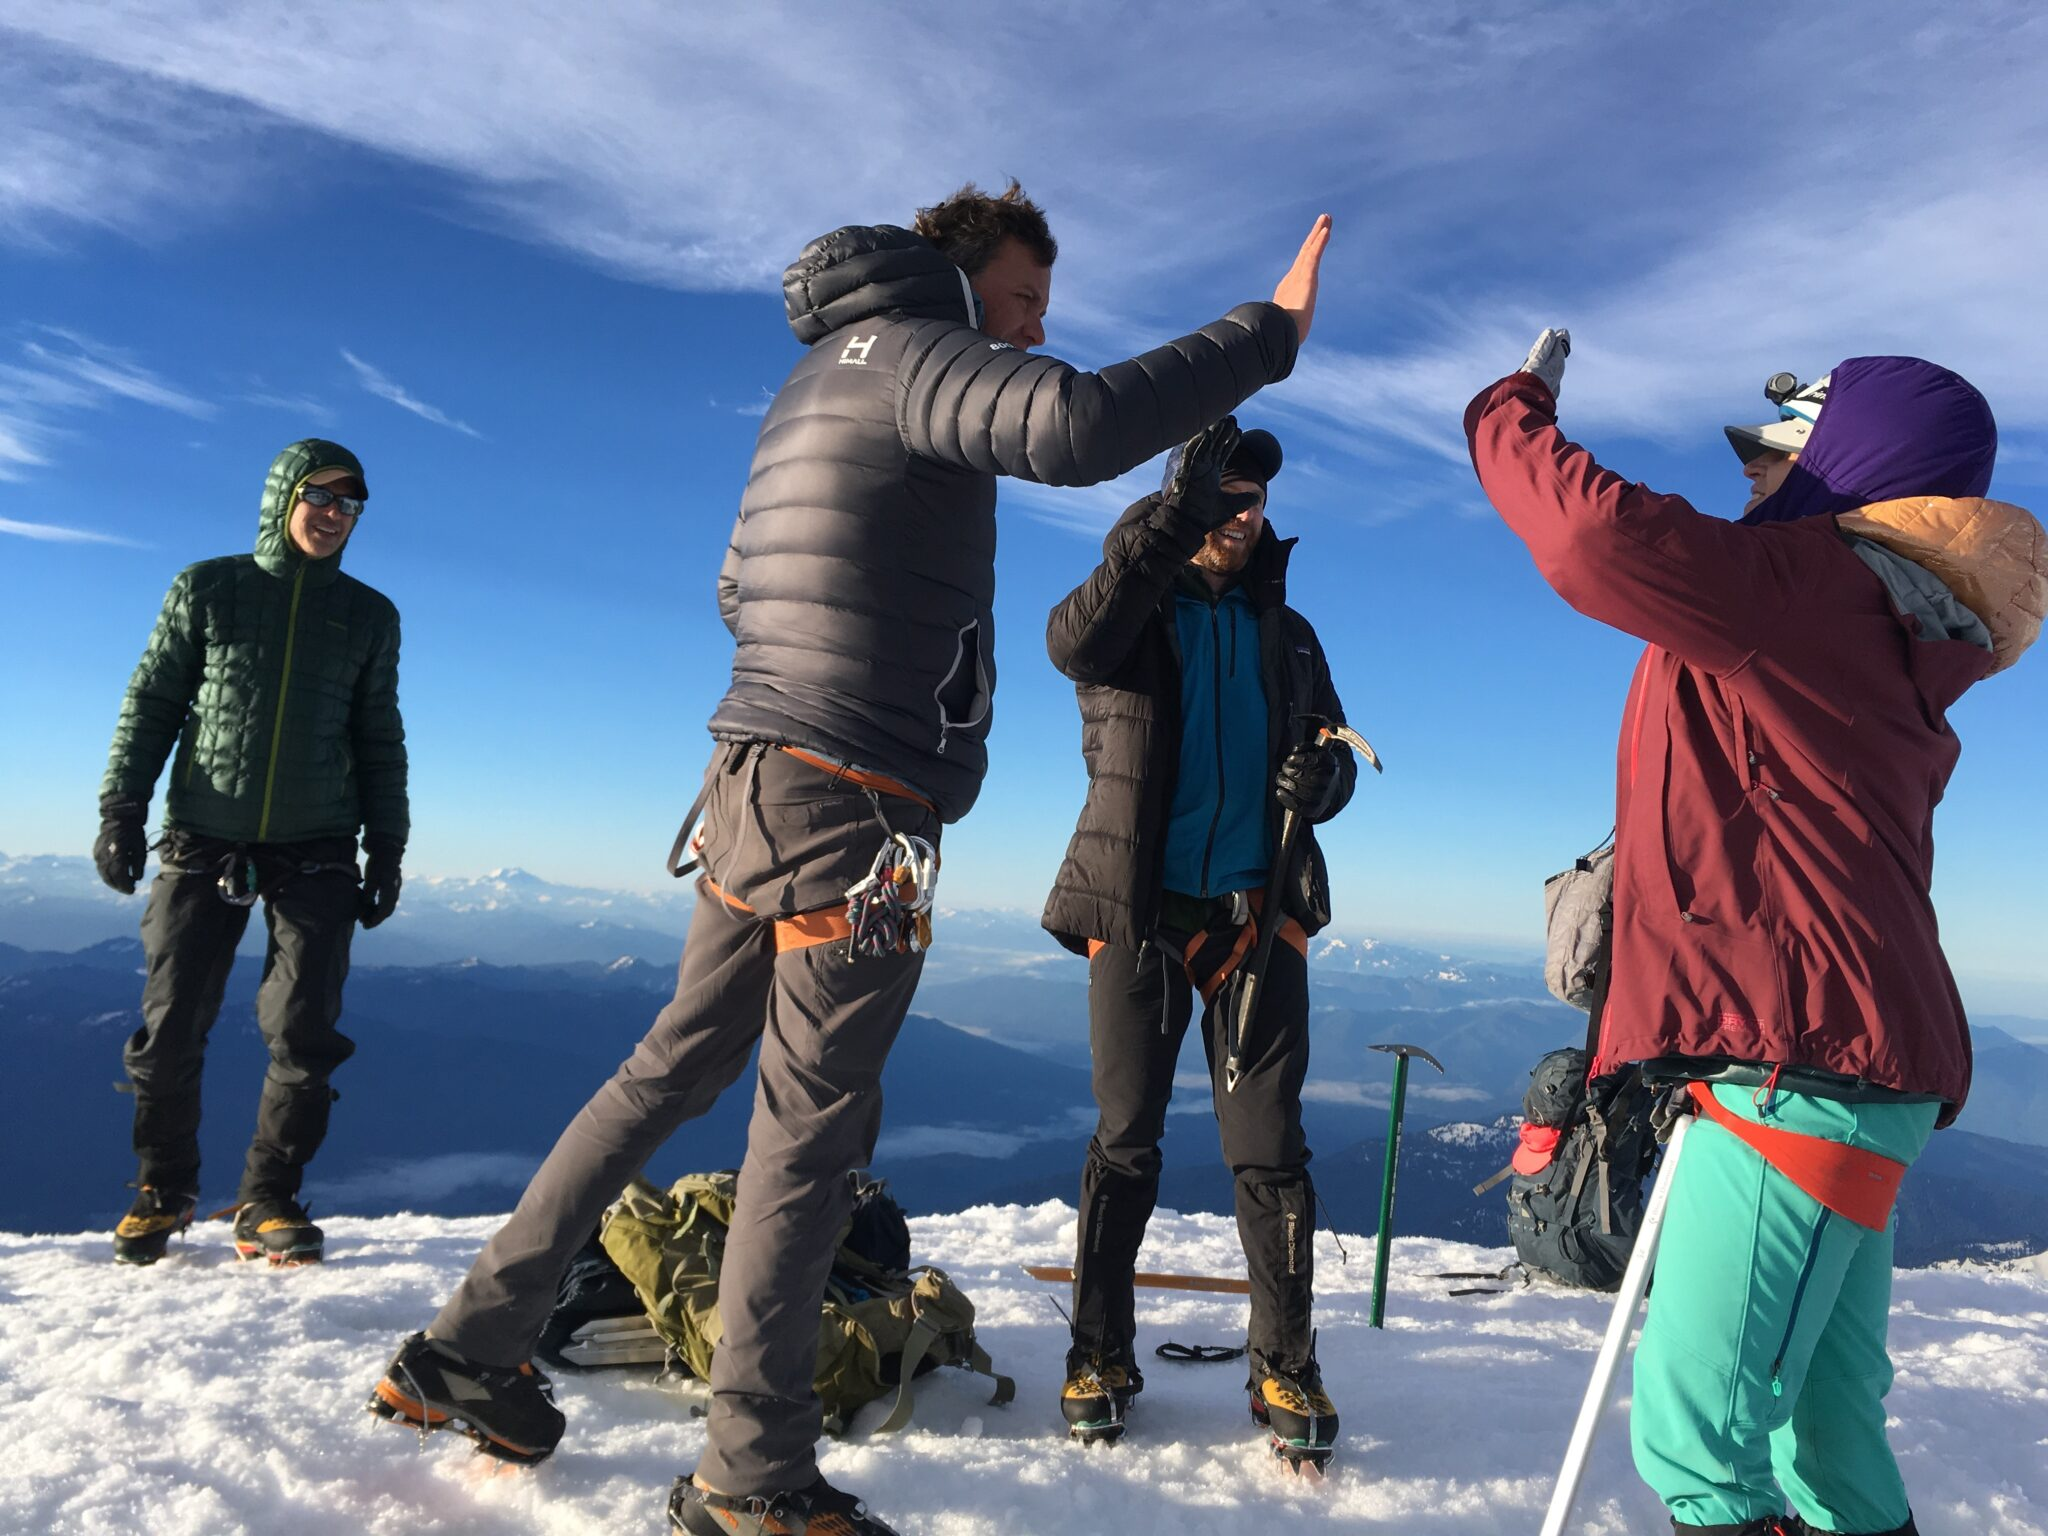 Celebrating 10 years of Northwest Alpine Guides adventures!